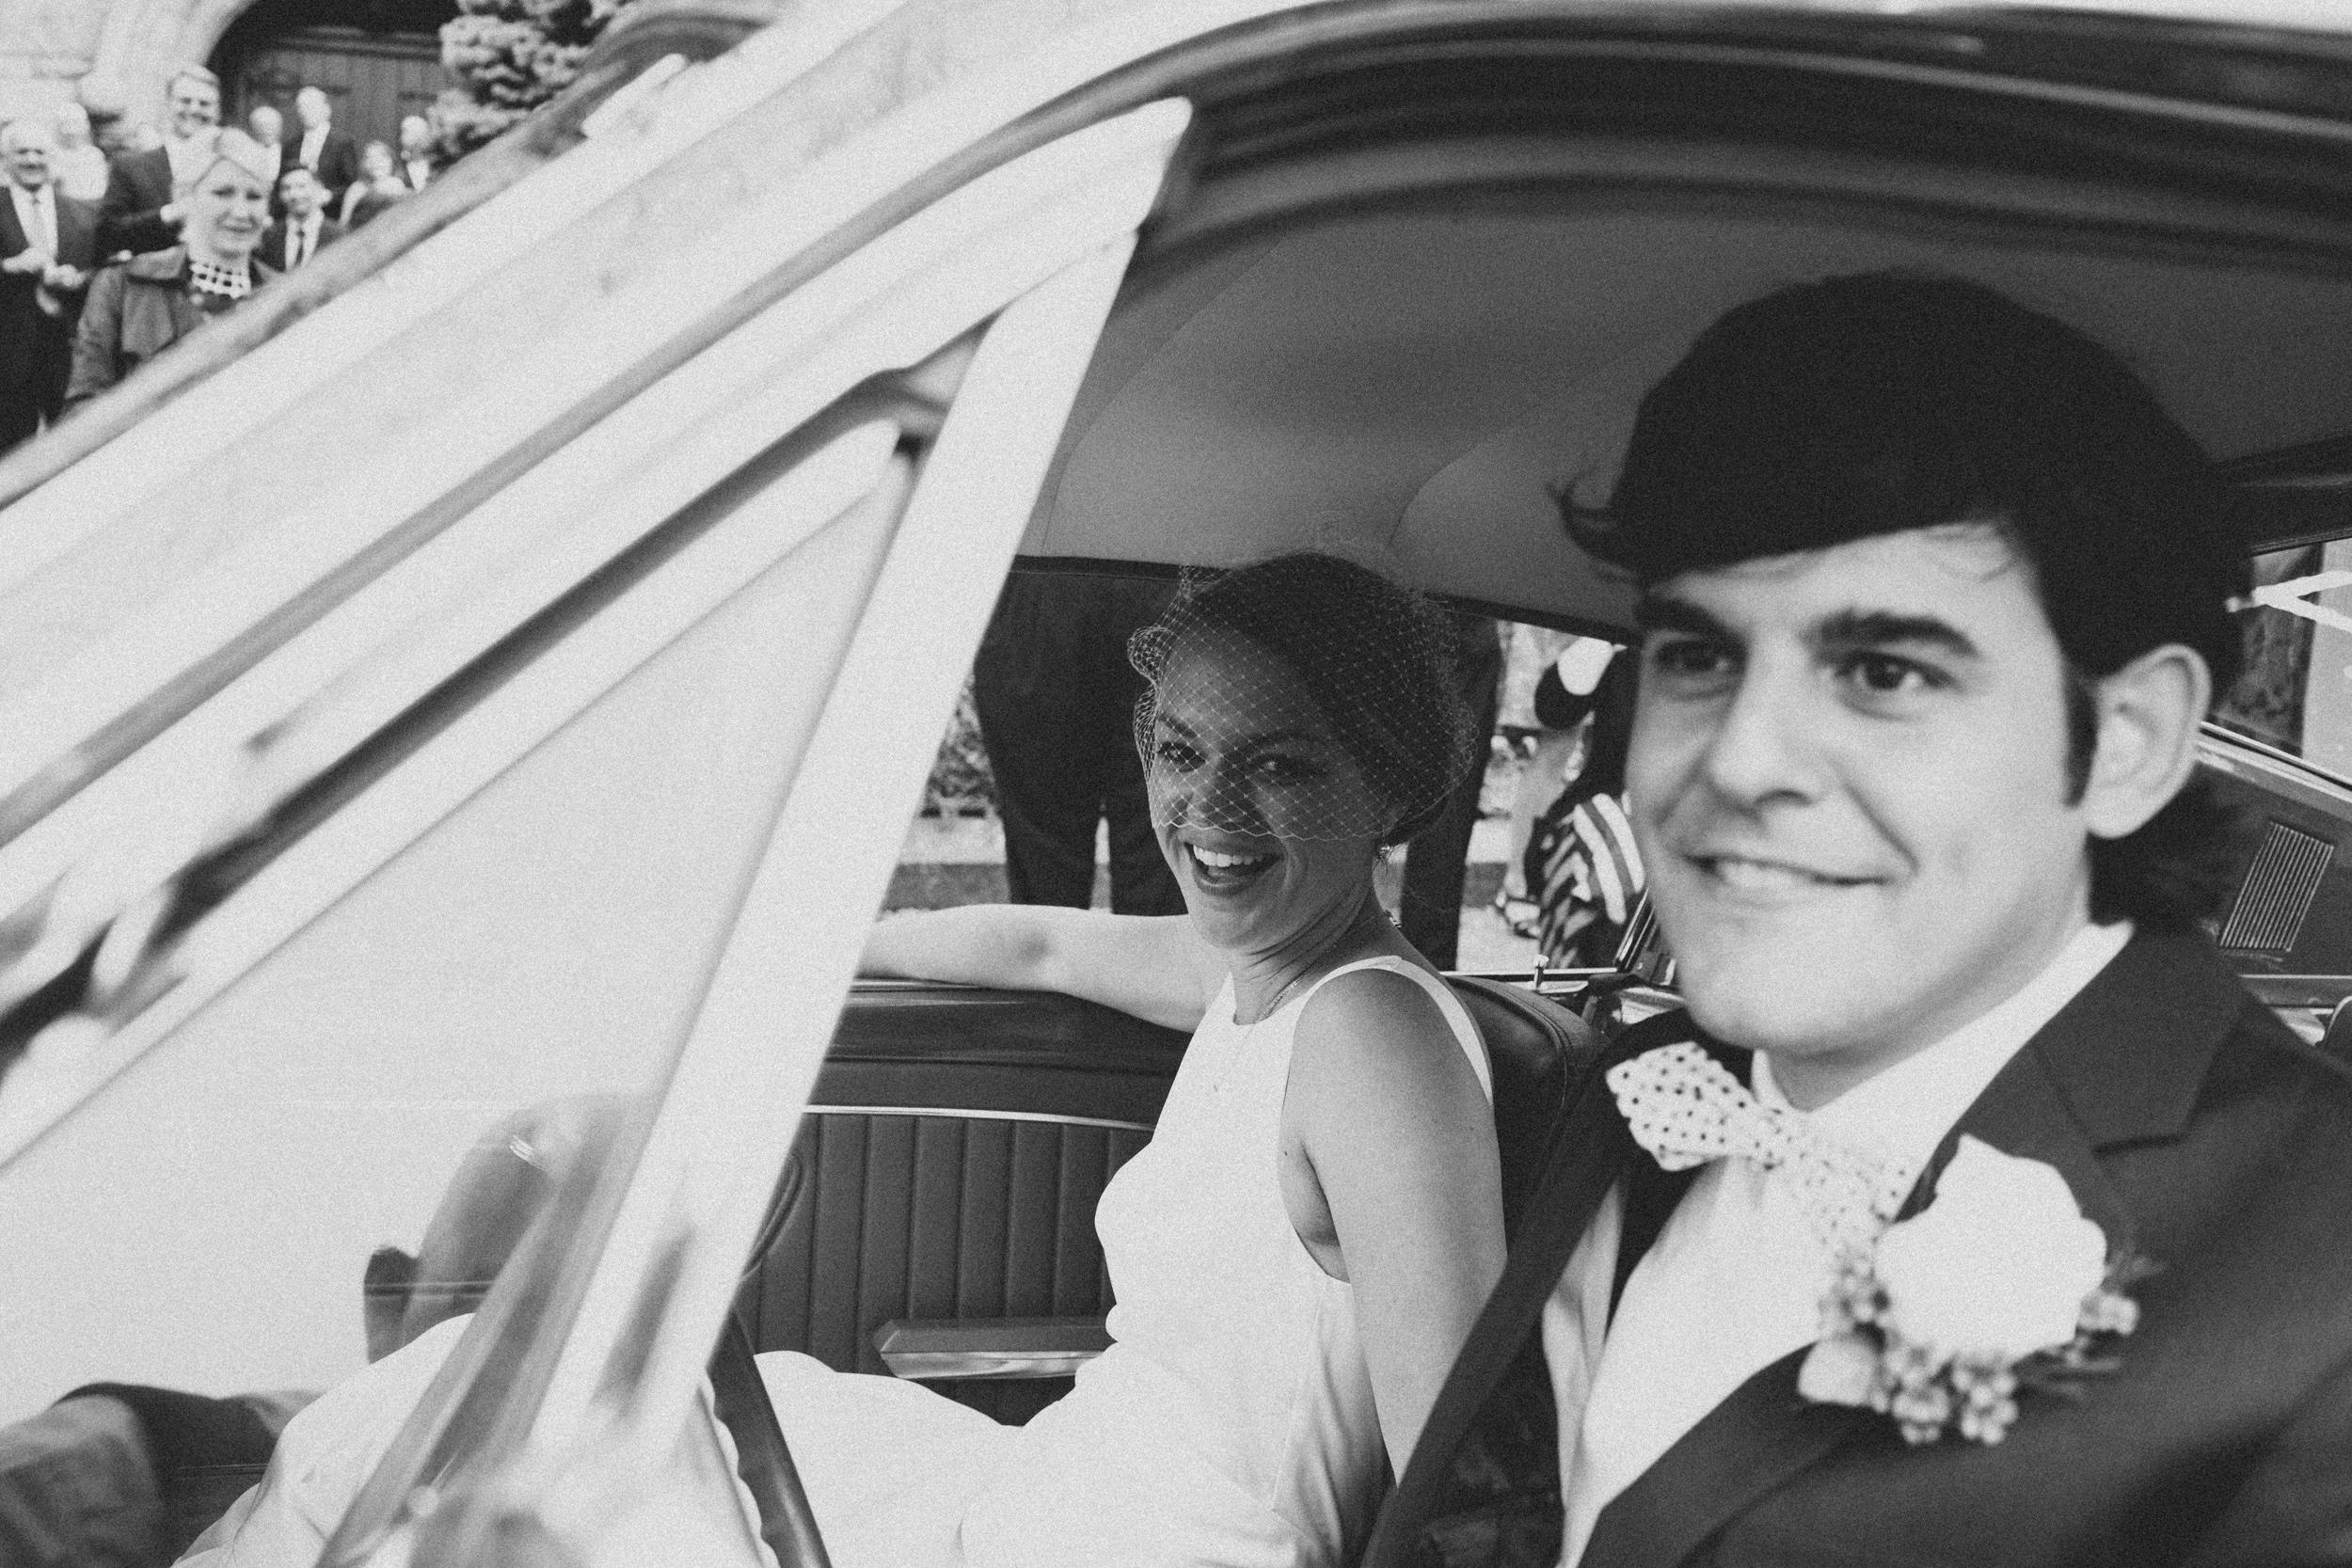 10-05-2013 maggie & adam wedding photography by brian milo-142.jpg